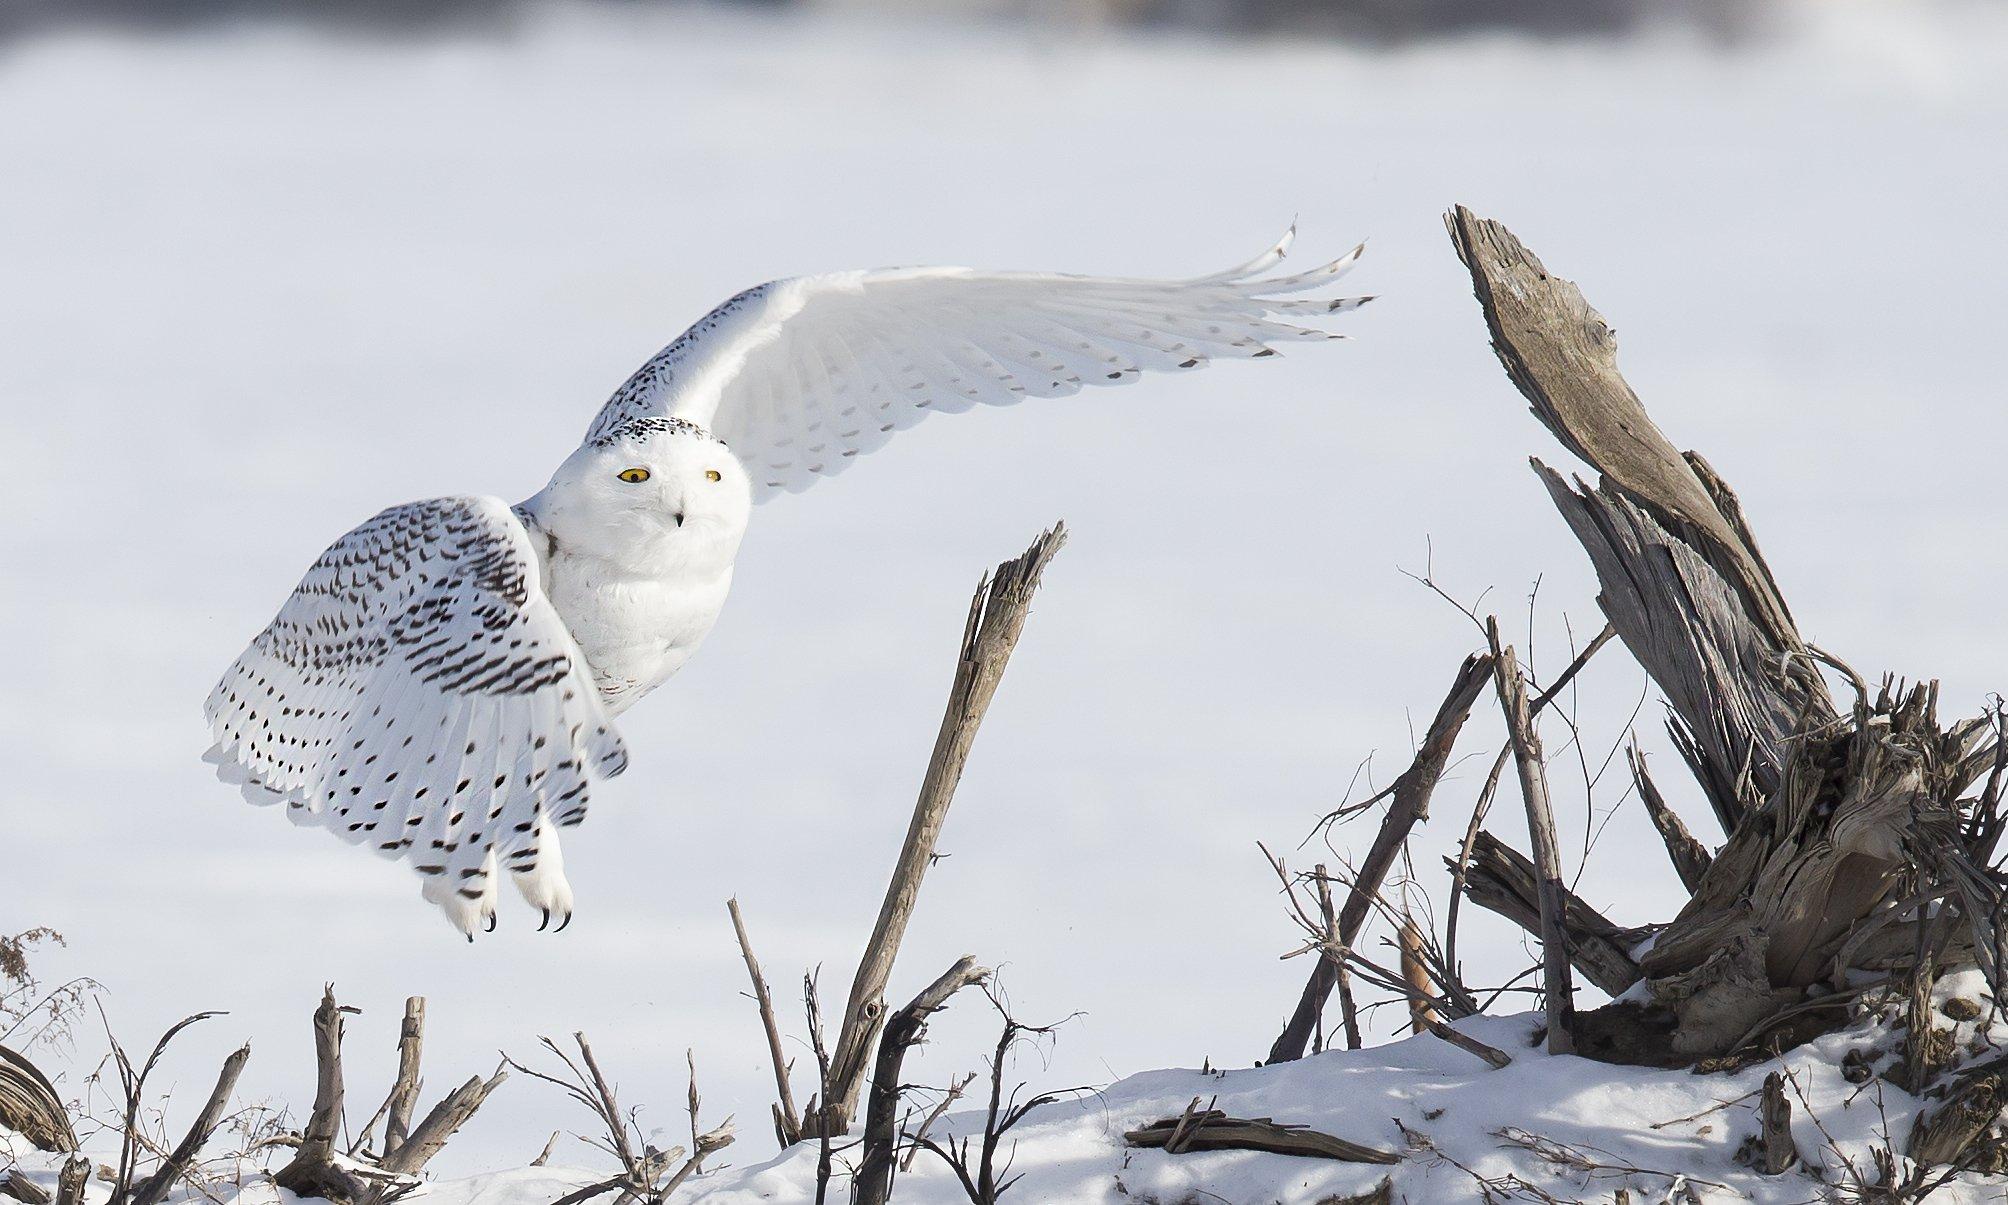 harfang / snowy owl / strix nebulosa, Jacques Falardeau